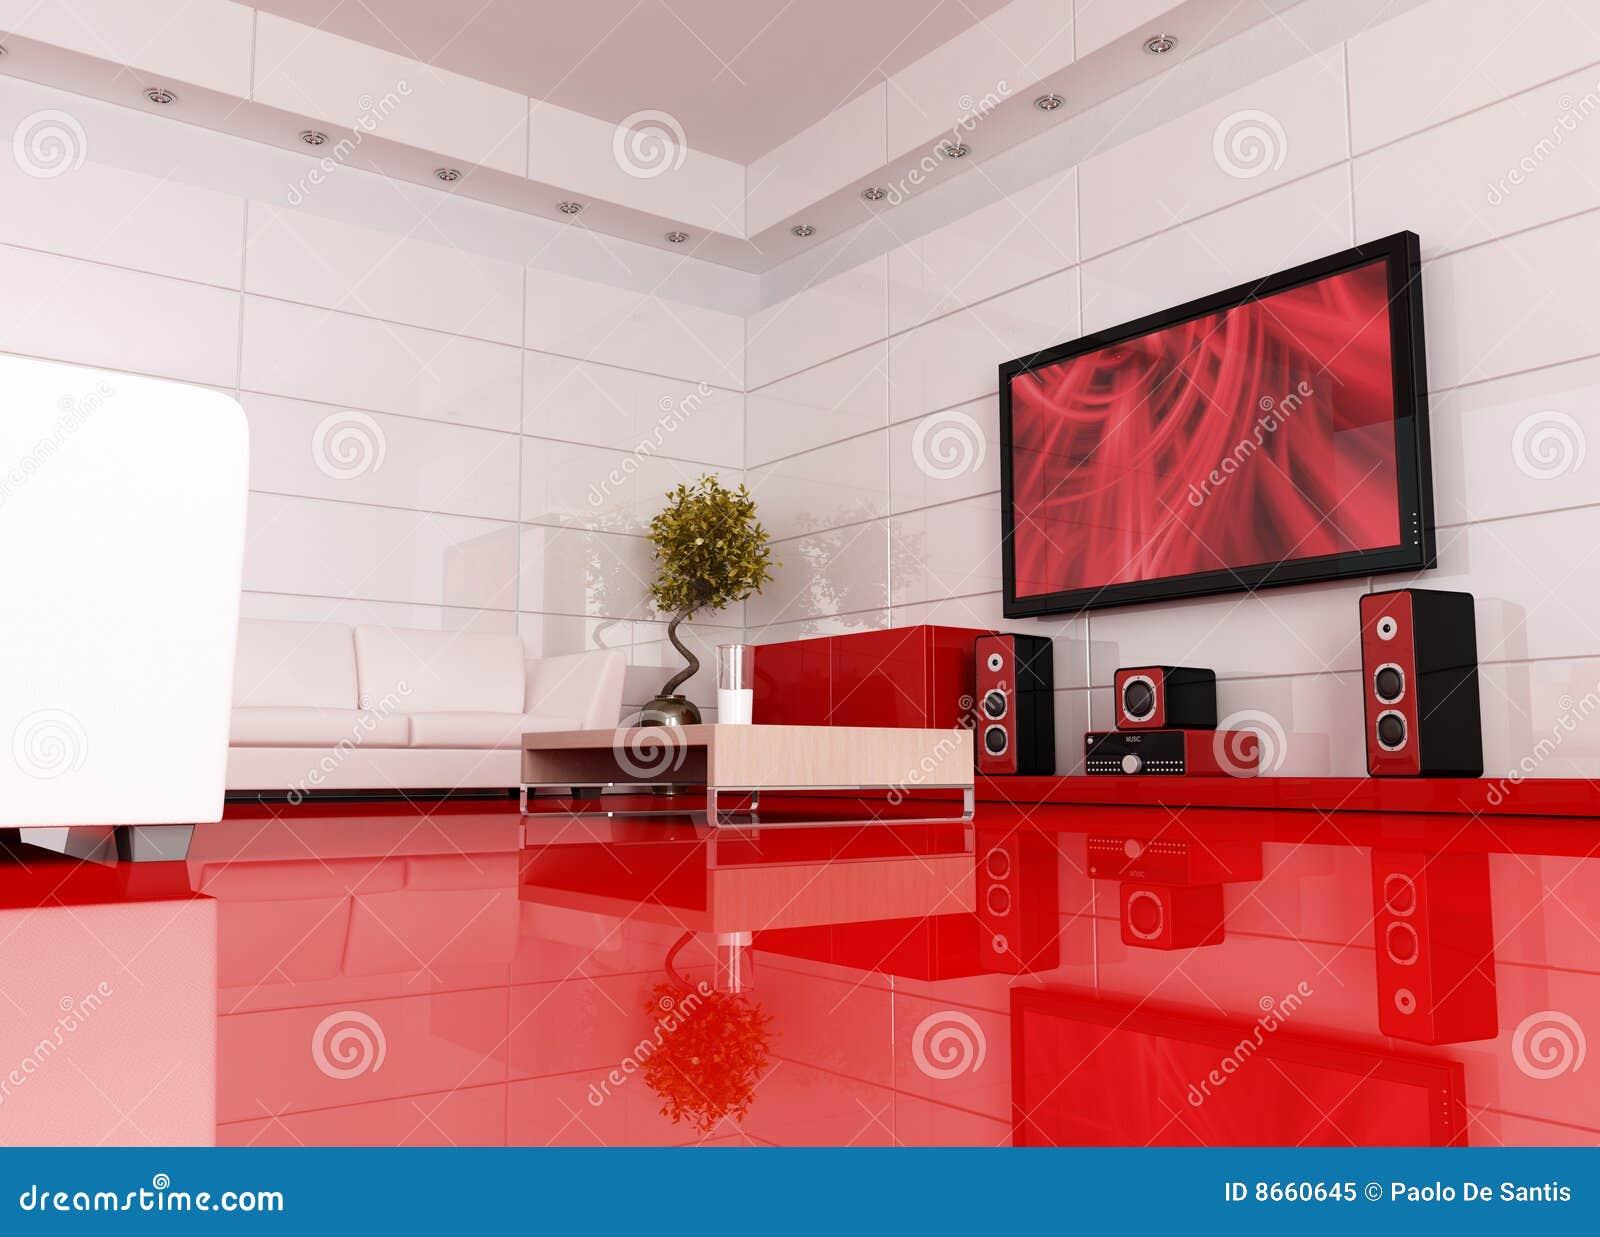 cinema - red room stock photos - image: 1681883